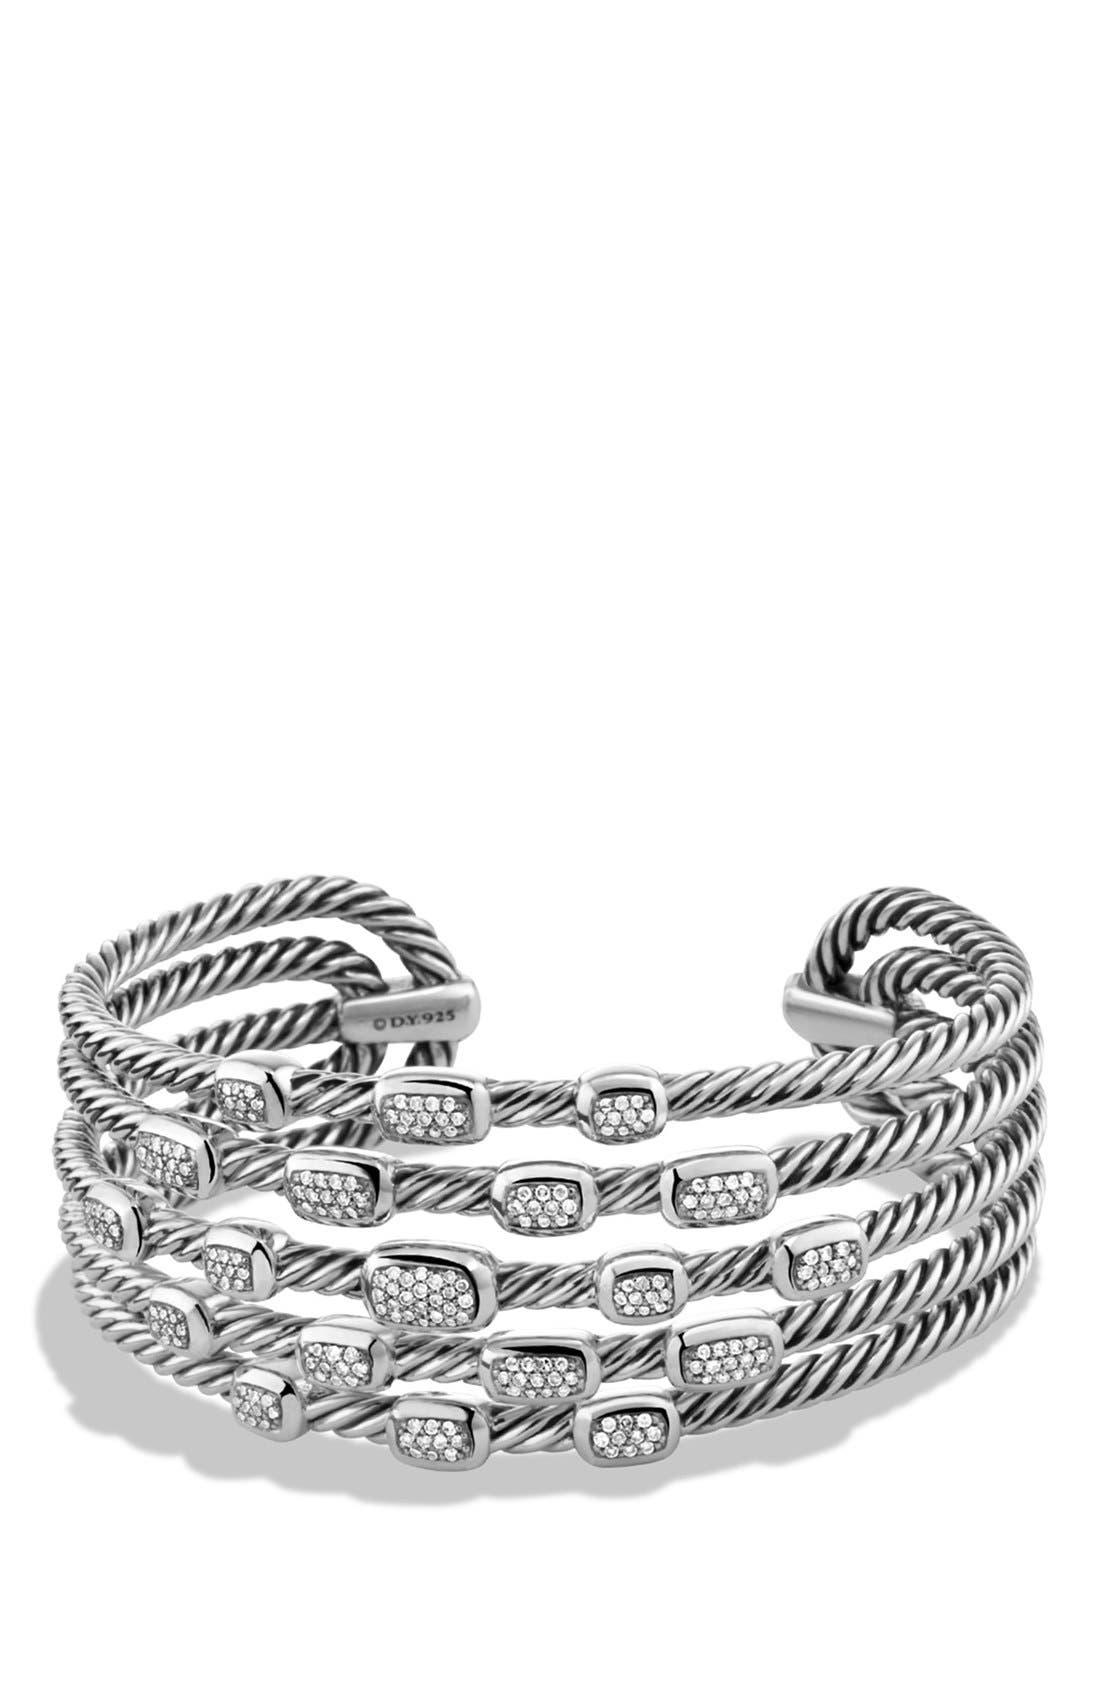 Alternate Image 1 Selected - David Yurman 'Confetti' Wide Cuff Bracelet with Diamonds